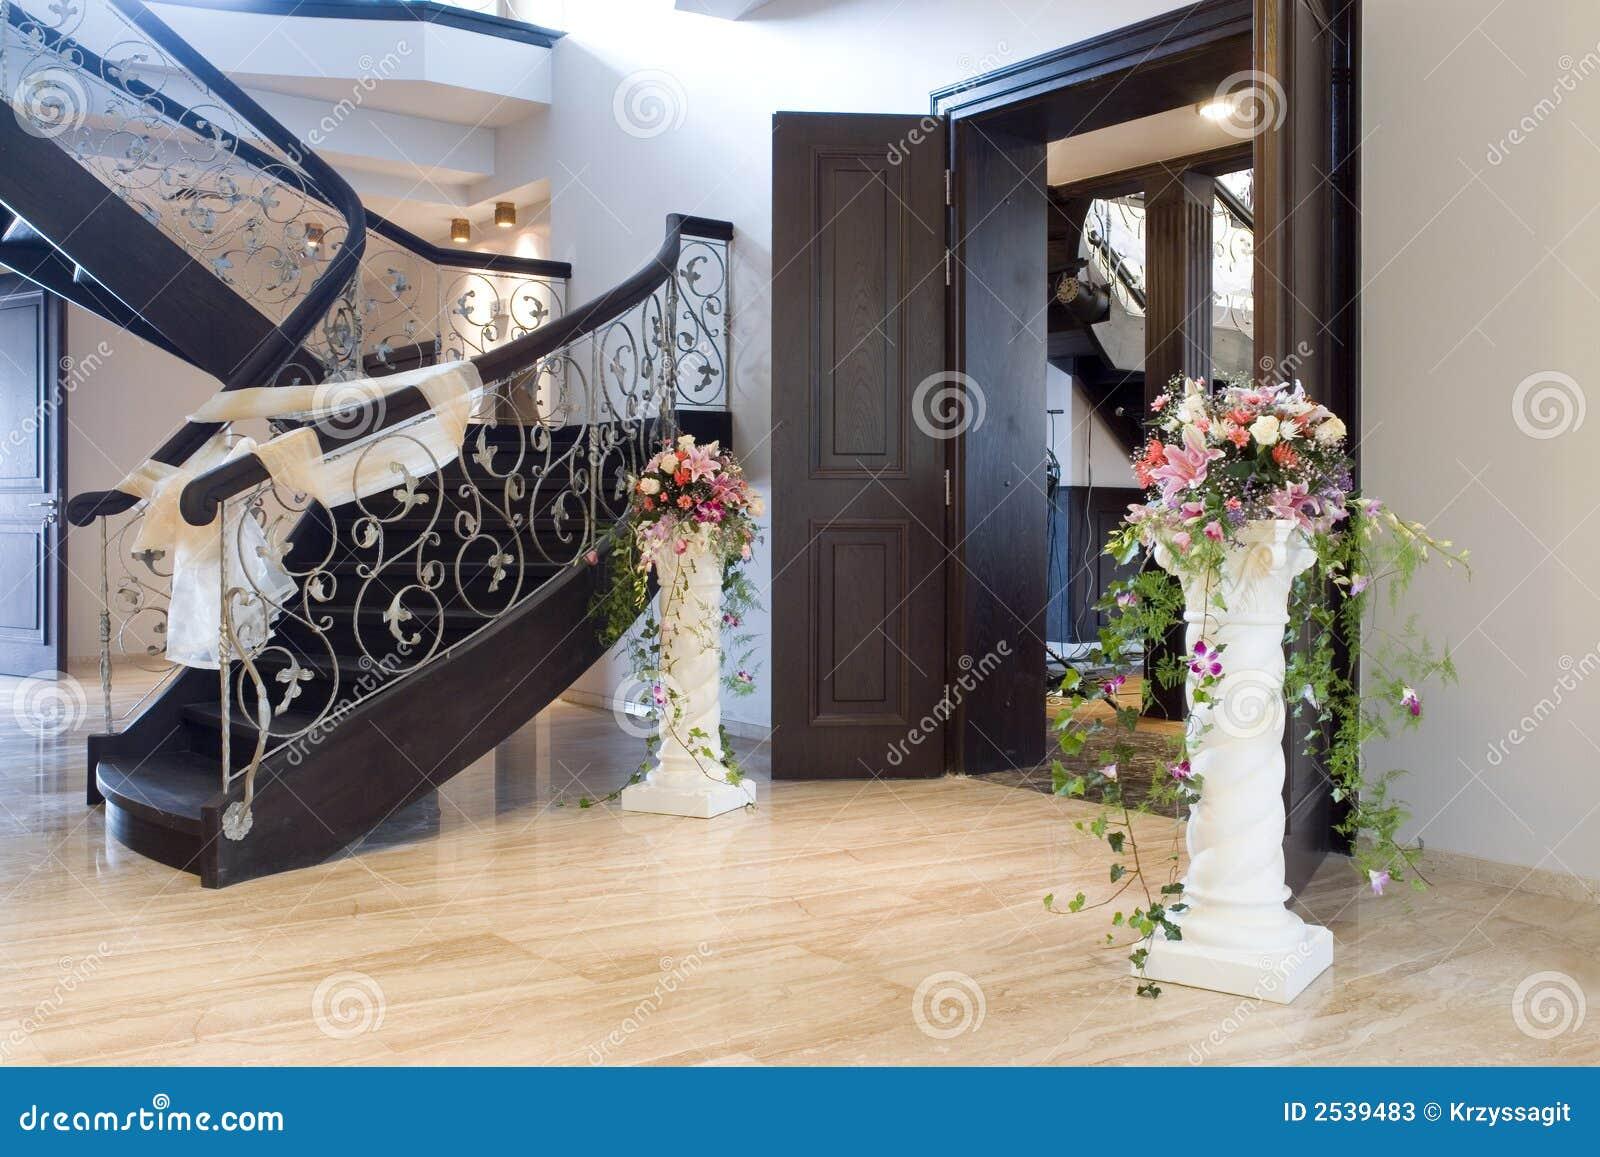 Elegant Interior Of A House Stock Photos Image 2539483